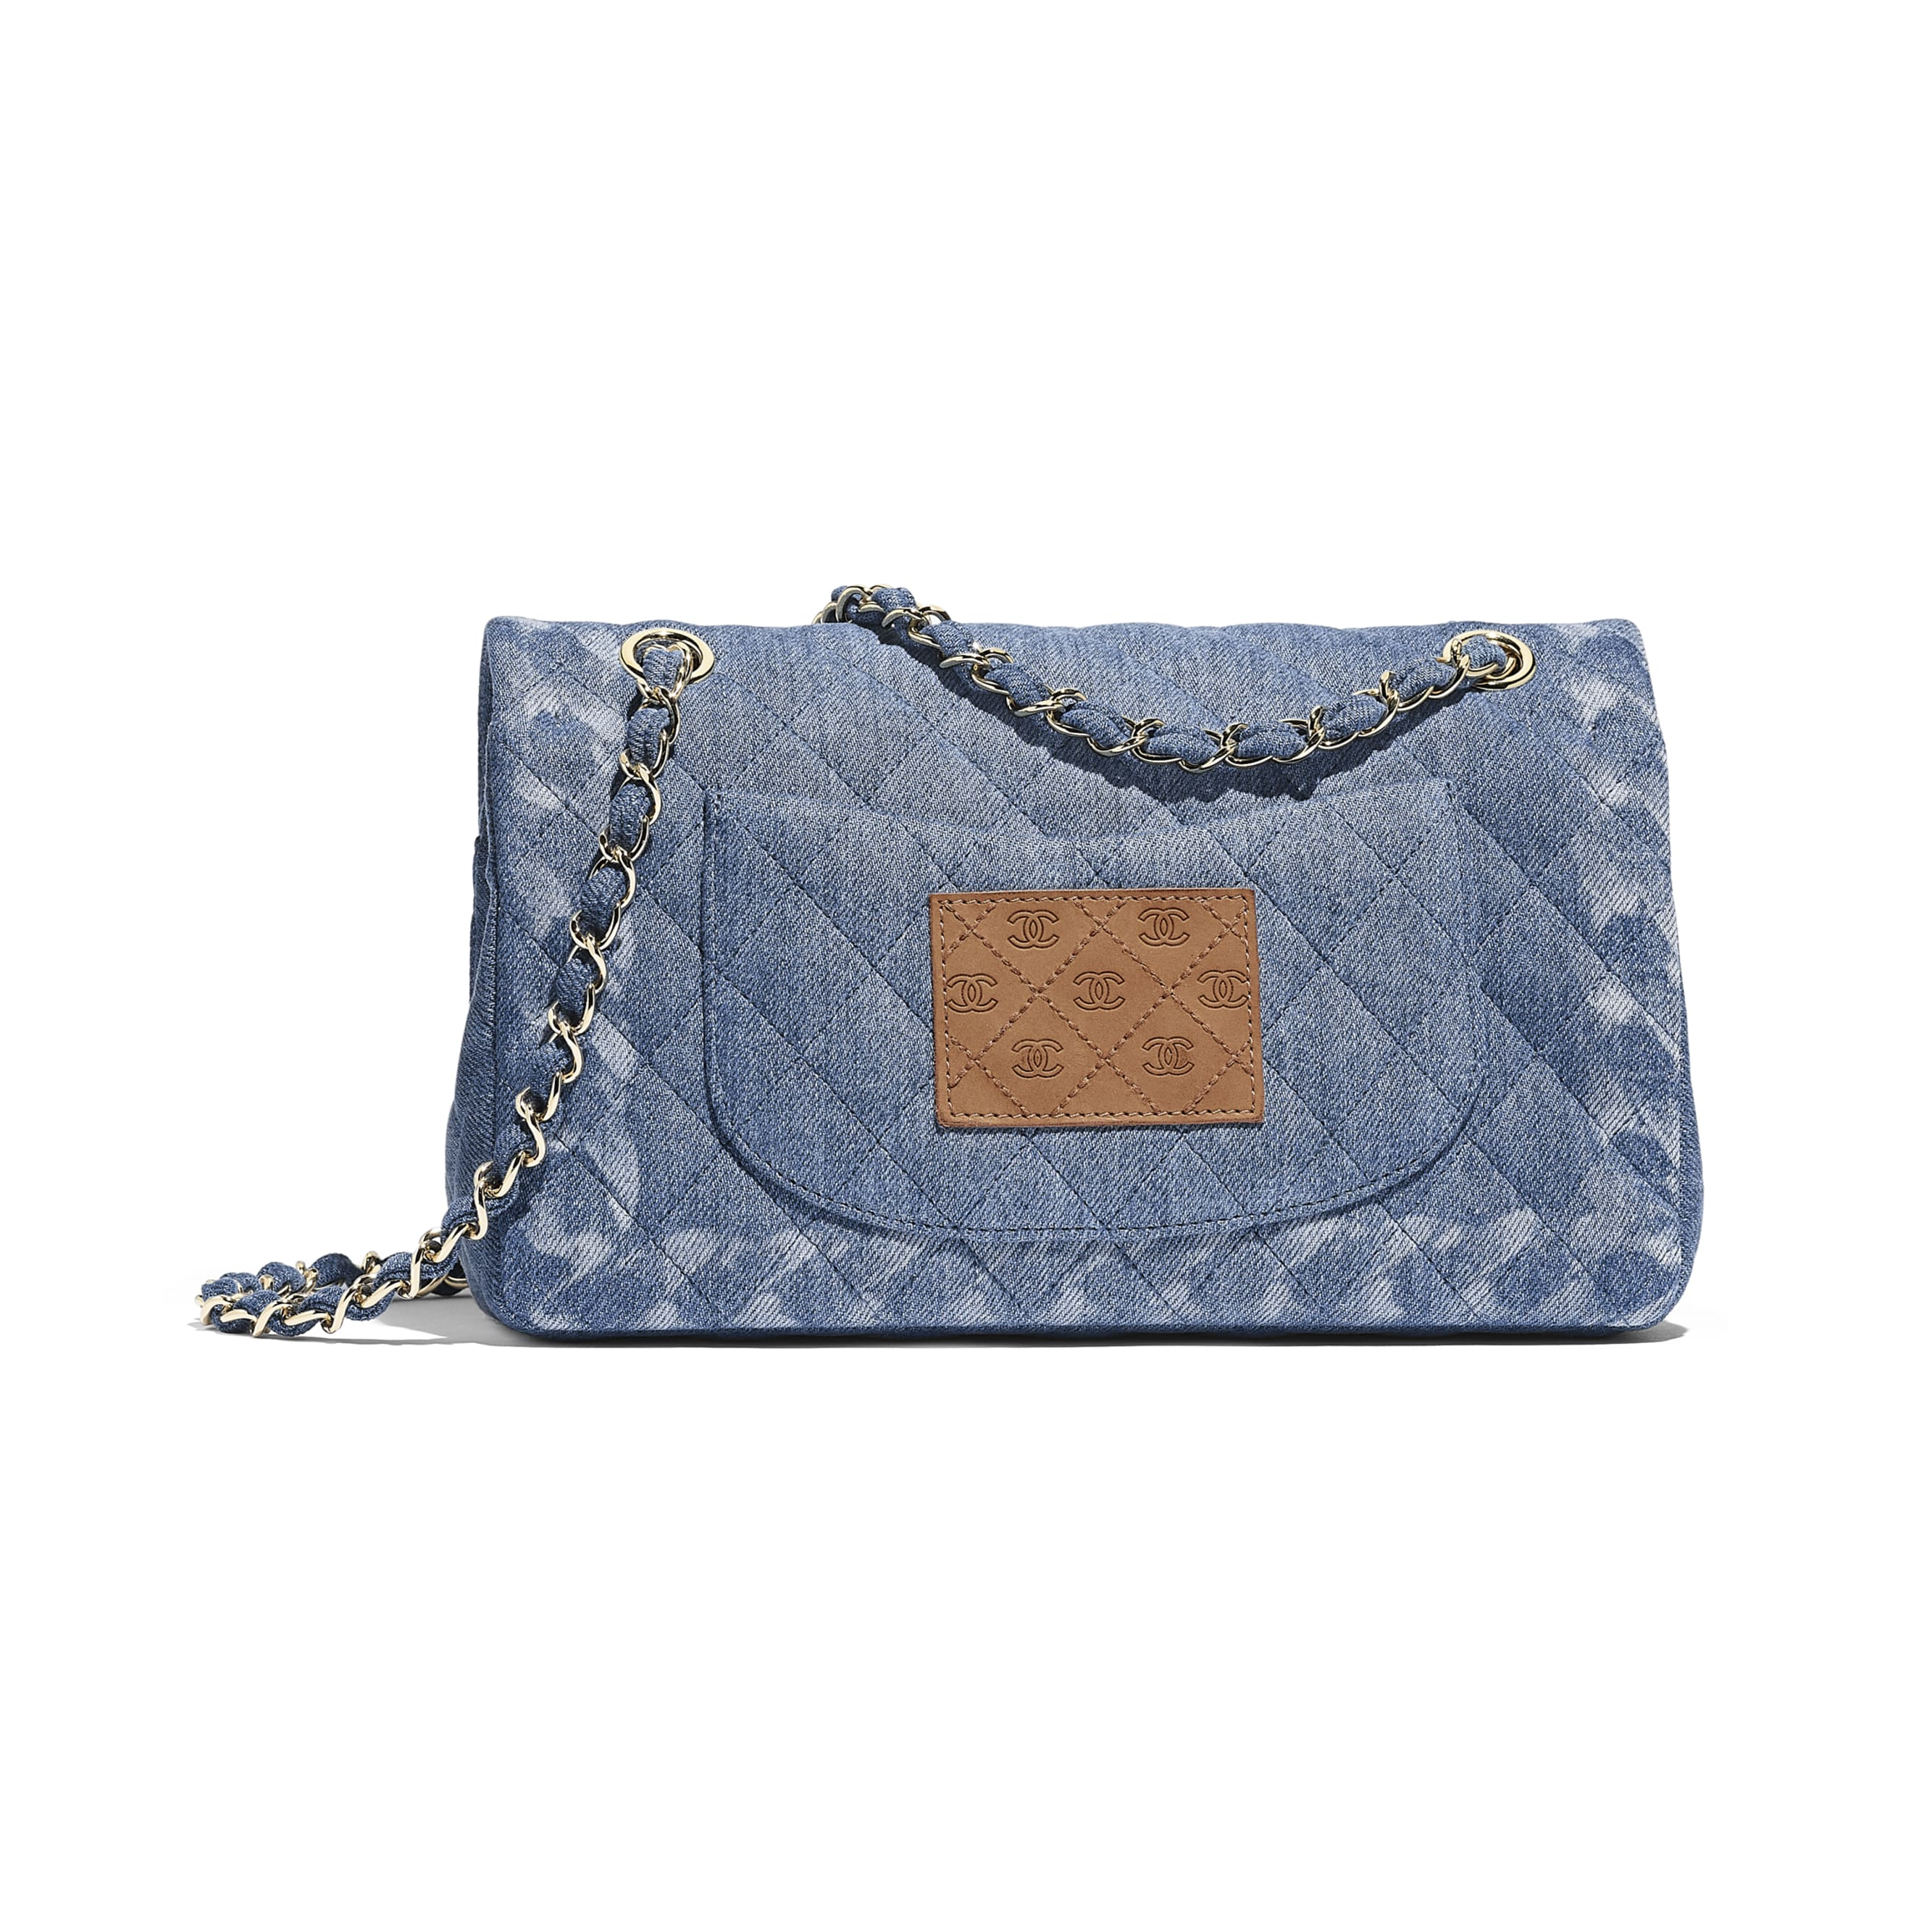 Classic Handbag - Blue - Denim & Gold-Tone Metal - Alternative view - see standard sized version